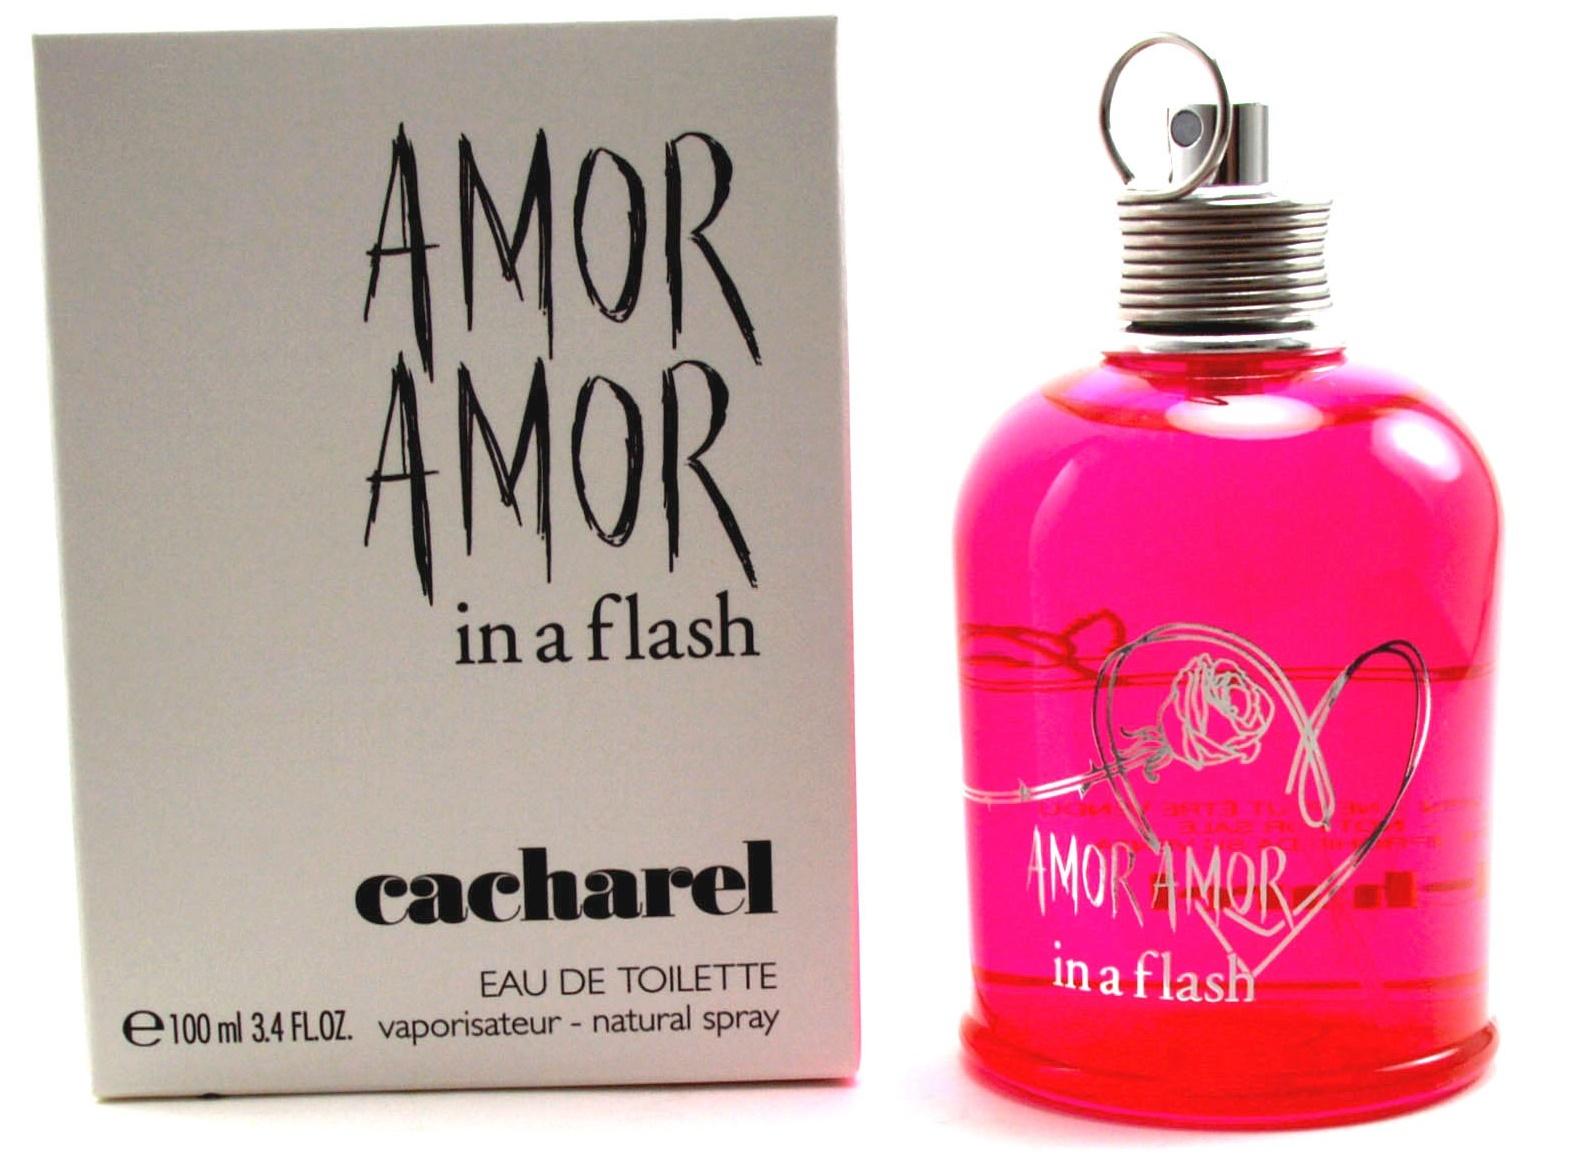 Cacharel Amor In a Flash, Toaletní voda - Tester, 100ml, Dámska vôňa